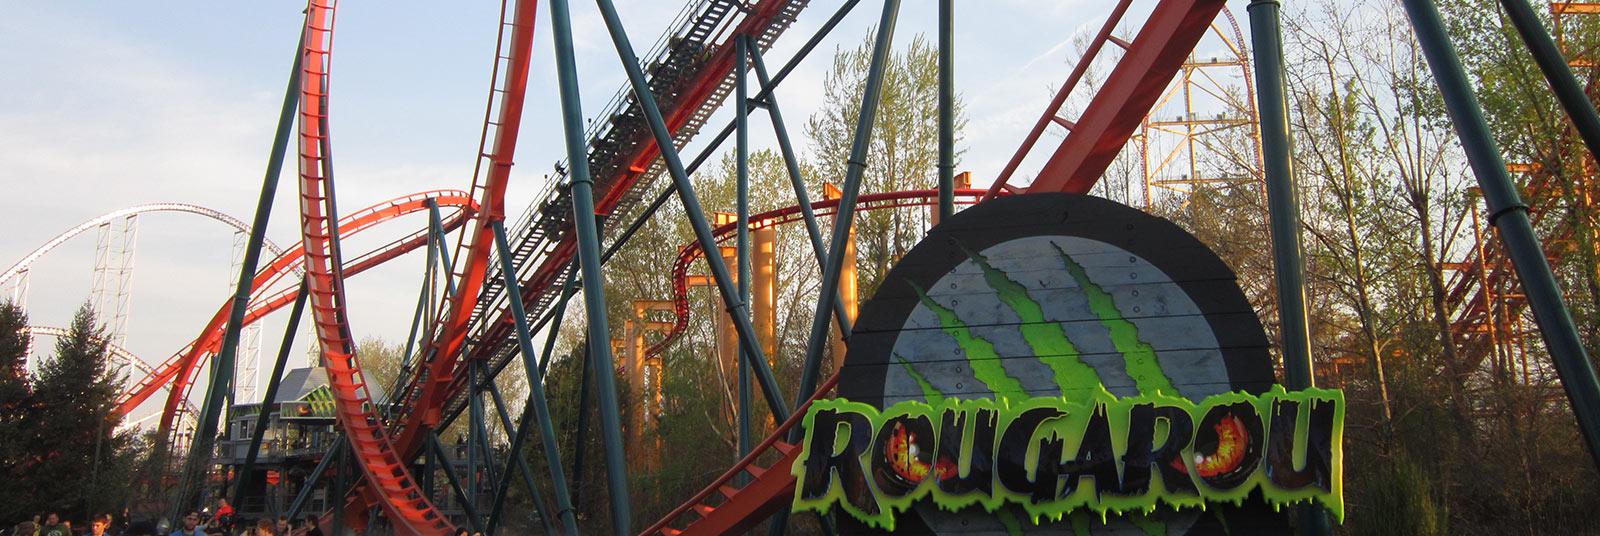 Cedar Point Rougarou Sandusky Ohio Theme Park